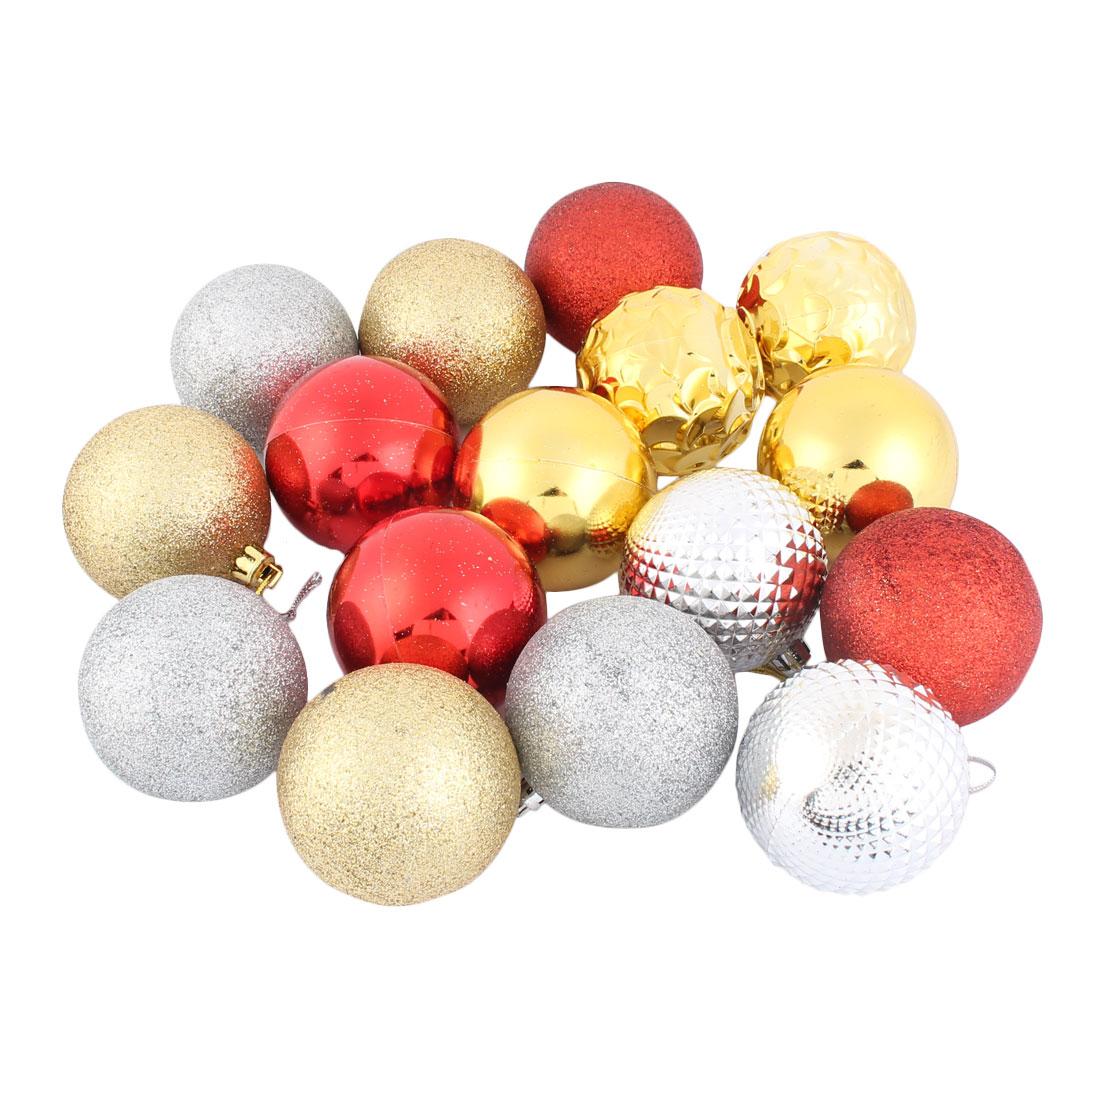 Festival Christmas Xmas Tree Ornament Party Yard Decor Hanging Balls Baubles 14pcs